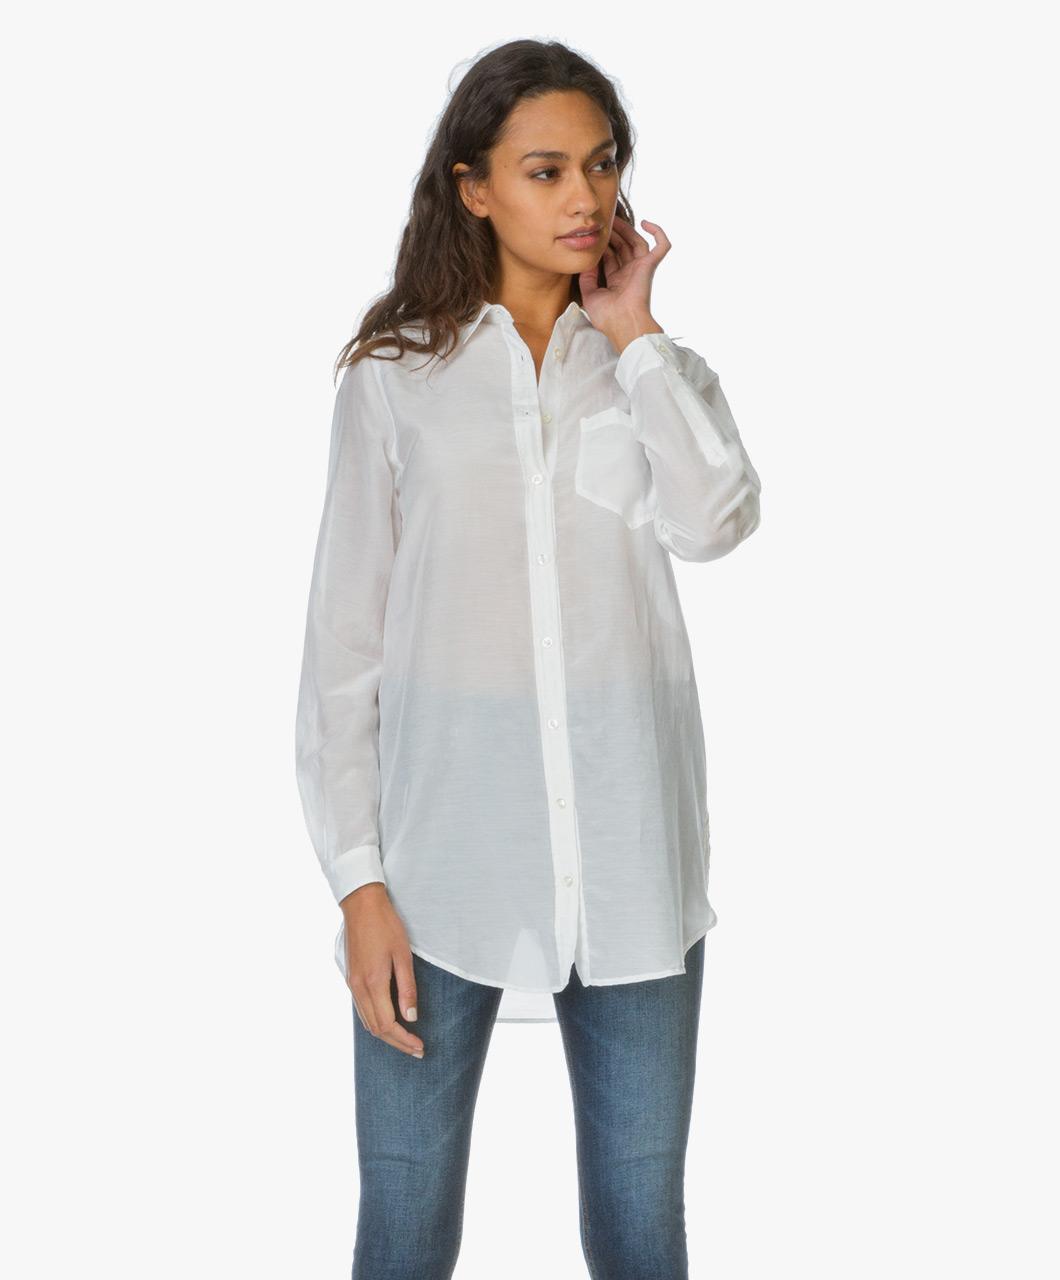 boss orange chrisler long blouse off white 50302101 100. Black Bedroom Furniture Sets. Home Design Ideas